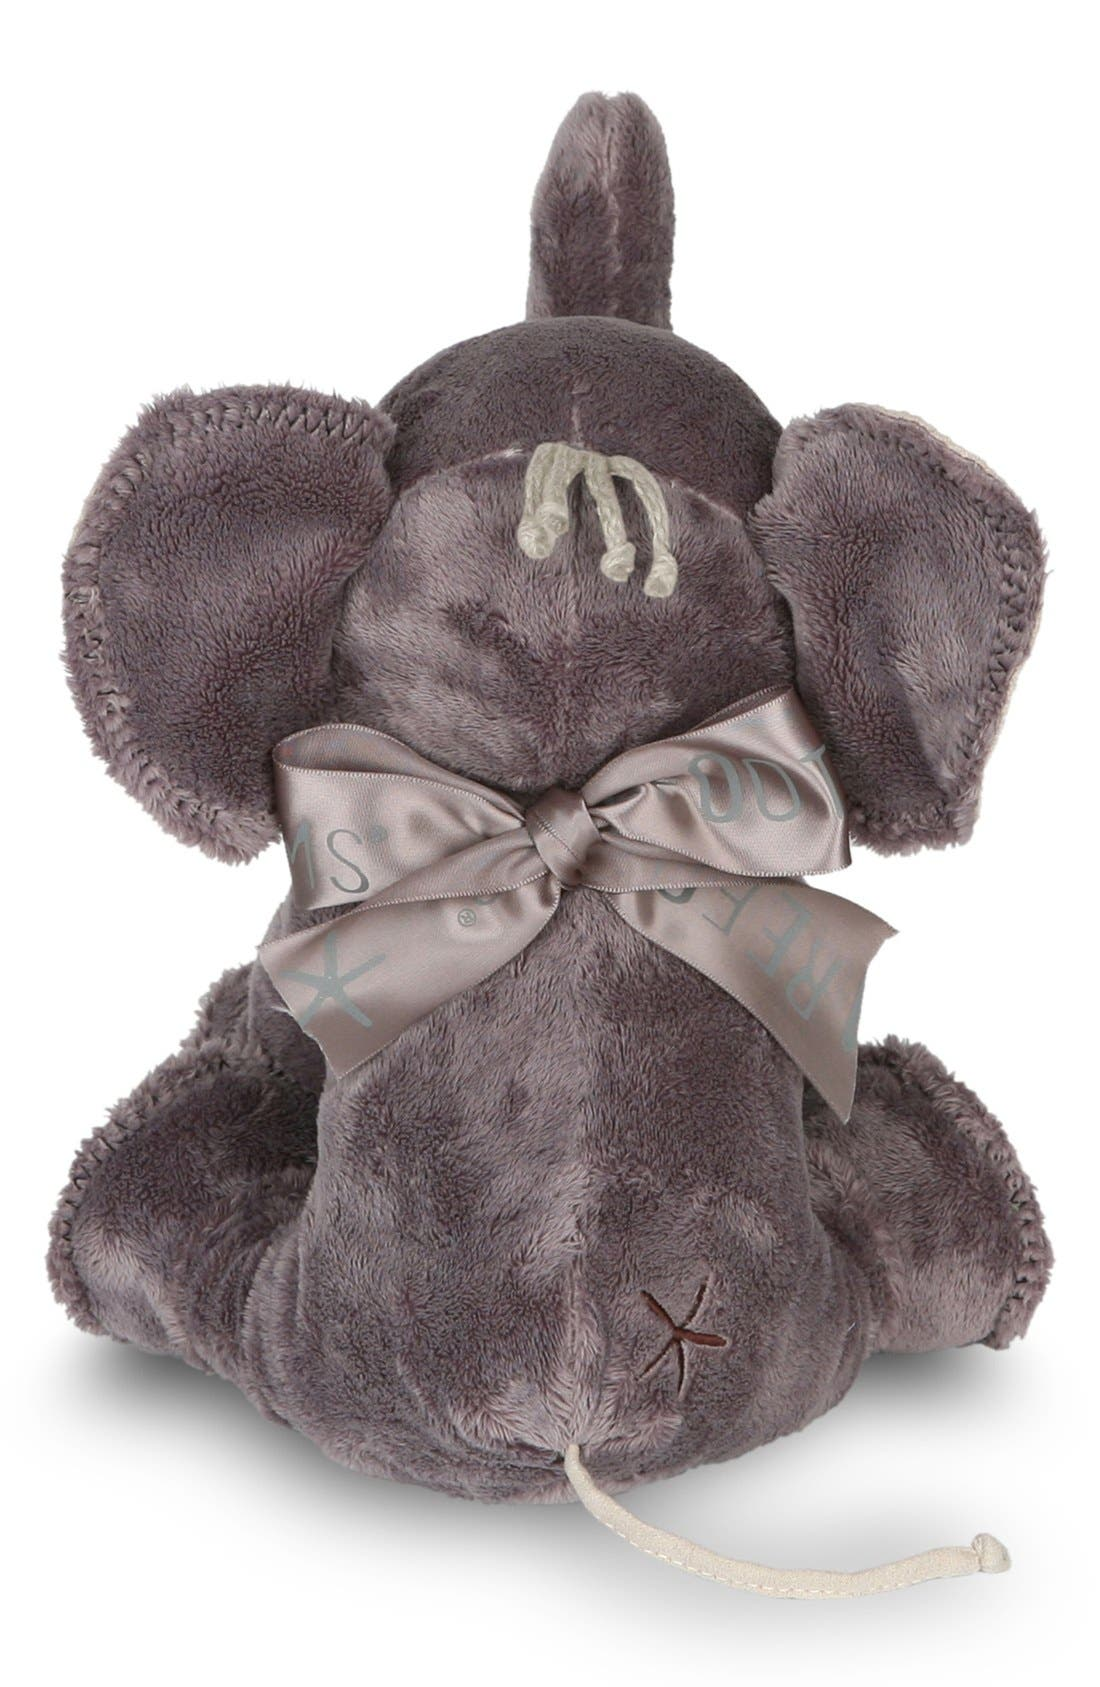 'Buddy the Elephant' Stuffed Animal,                             Alternate thumbnail 2, color,                             020